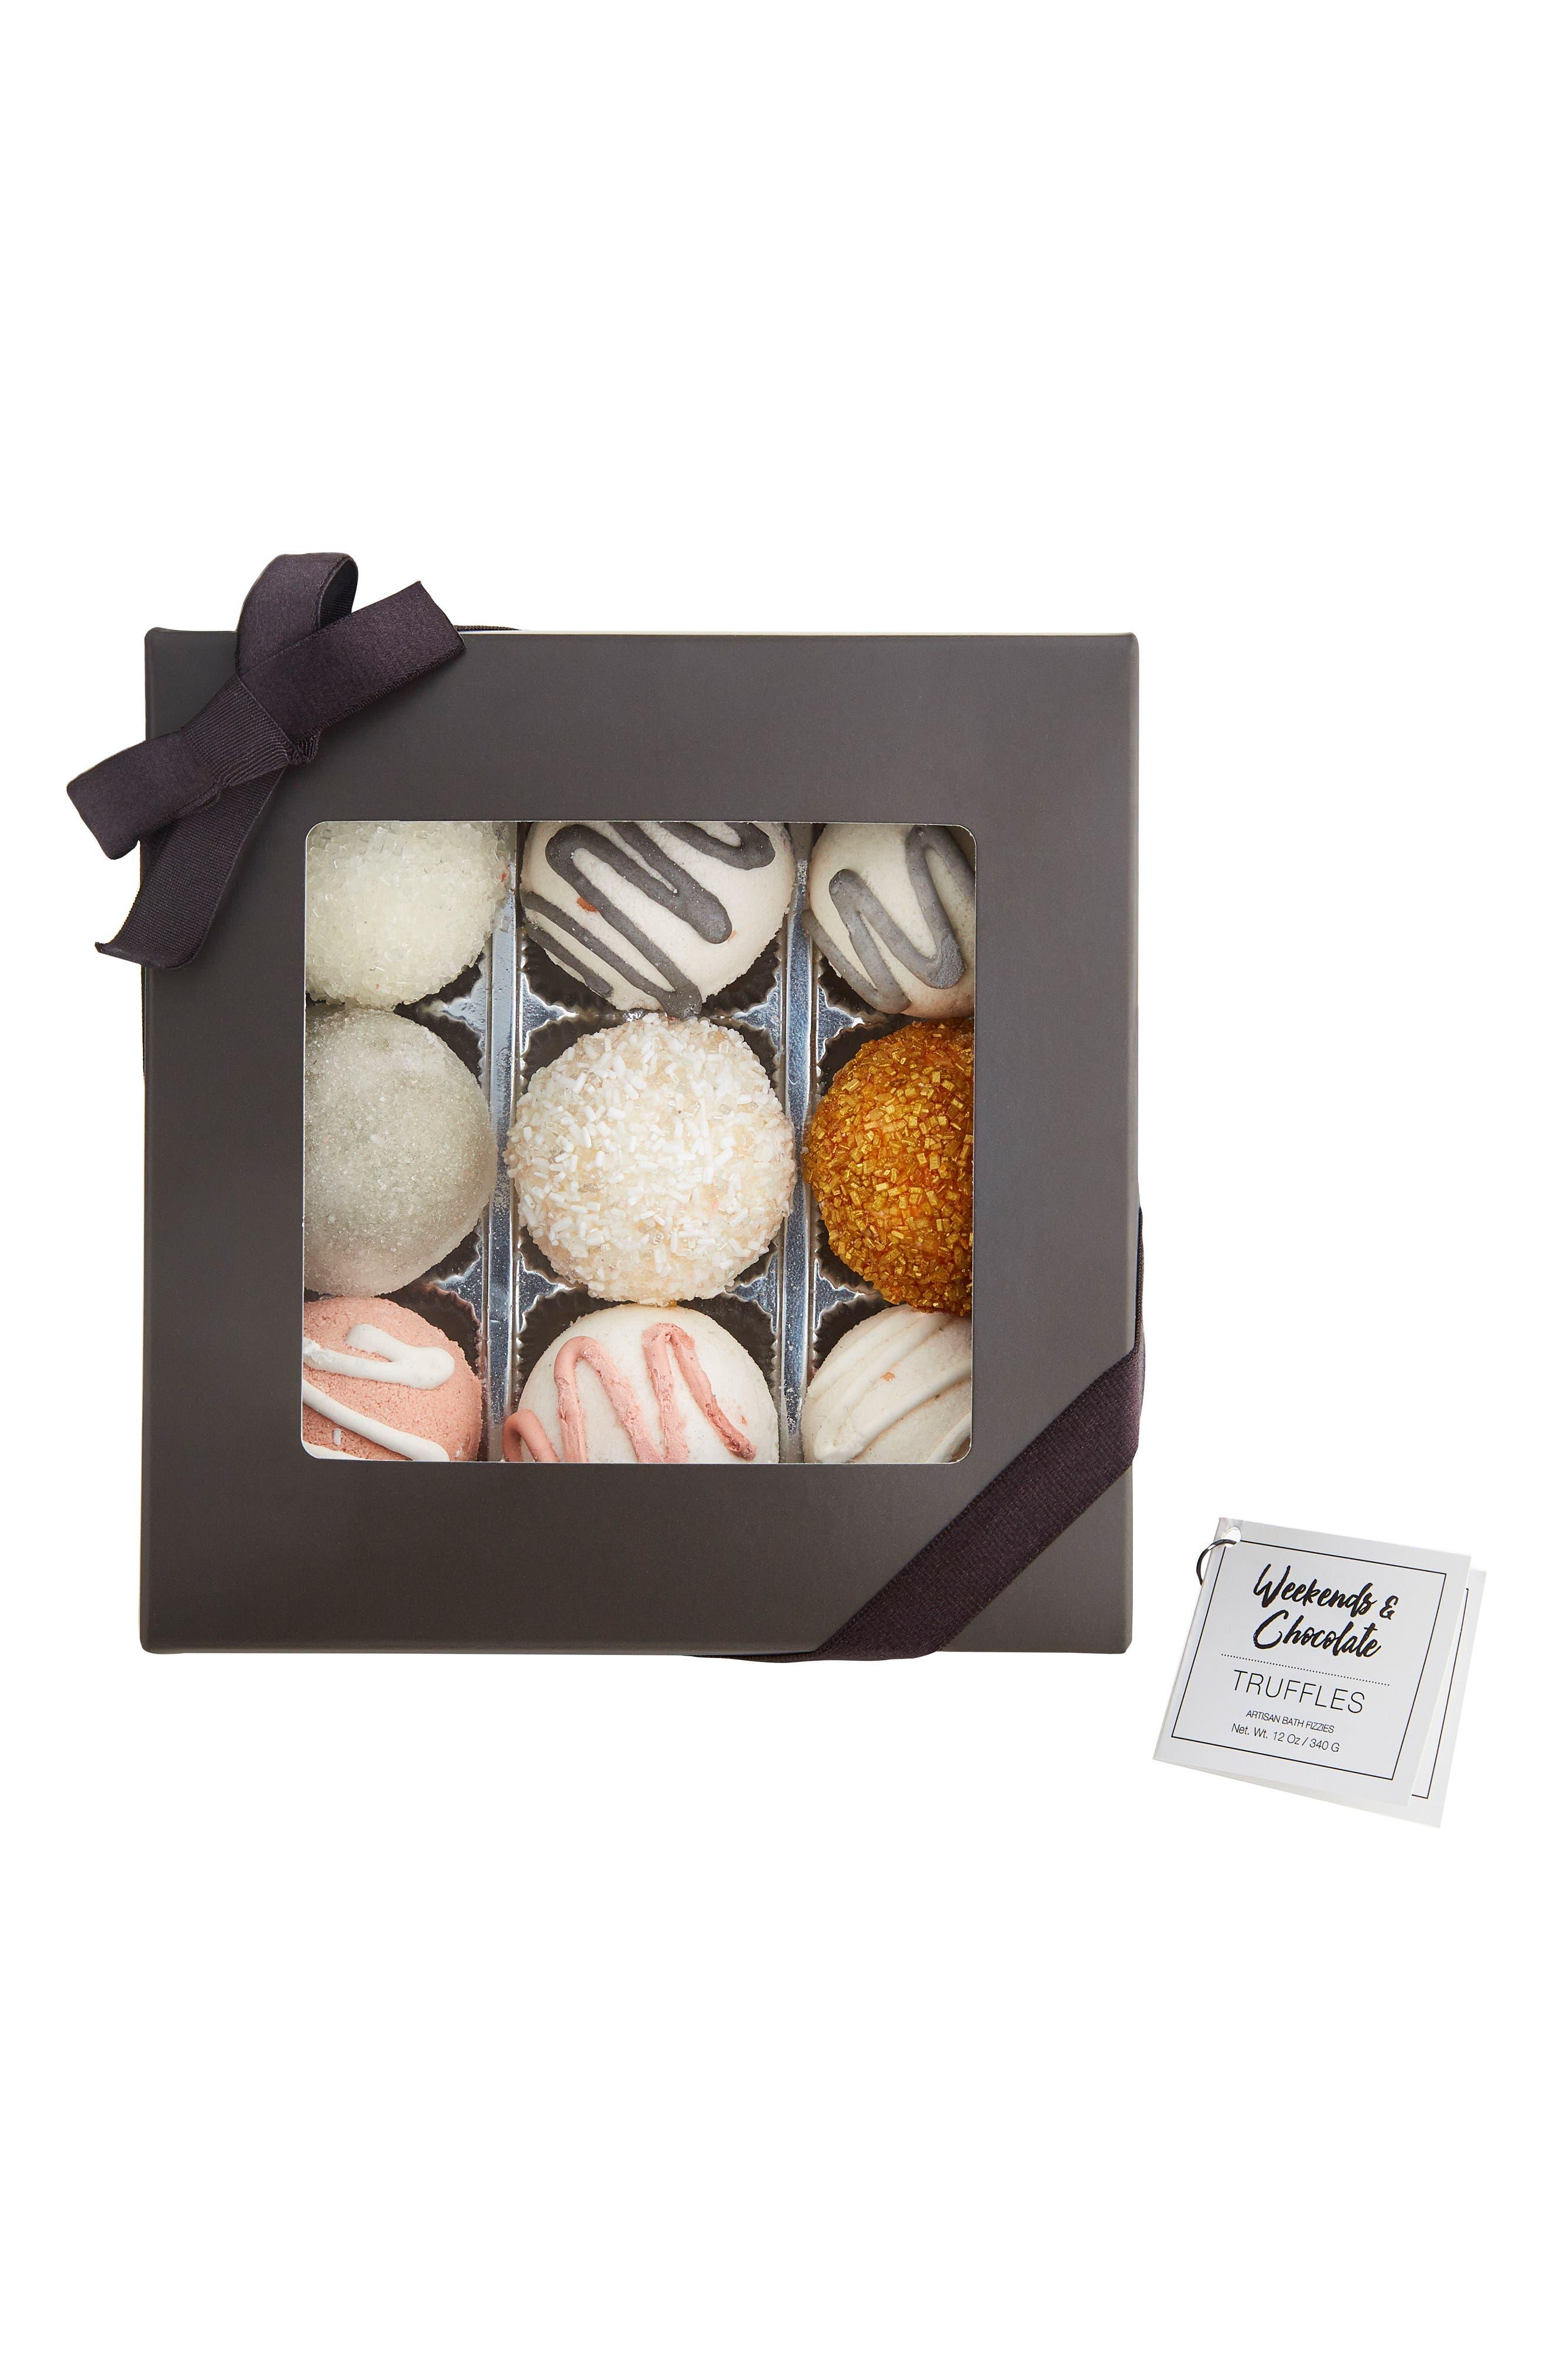 Main Image - Weekends & Chocolate Bath Truffles